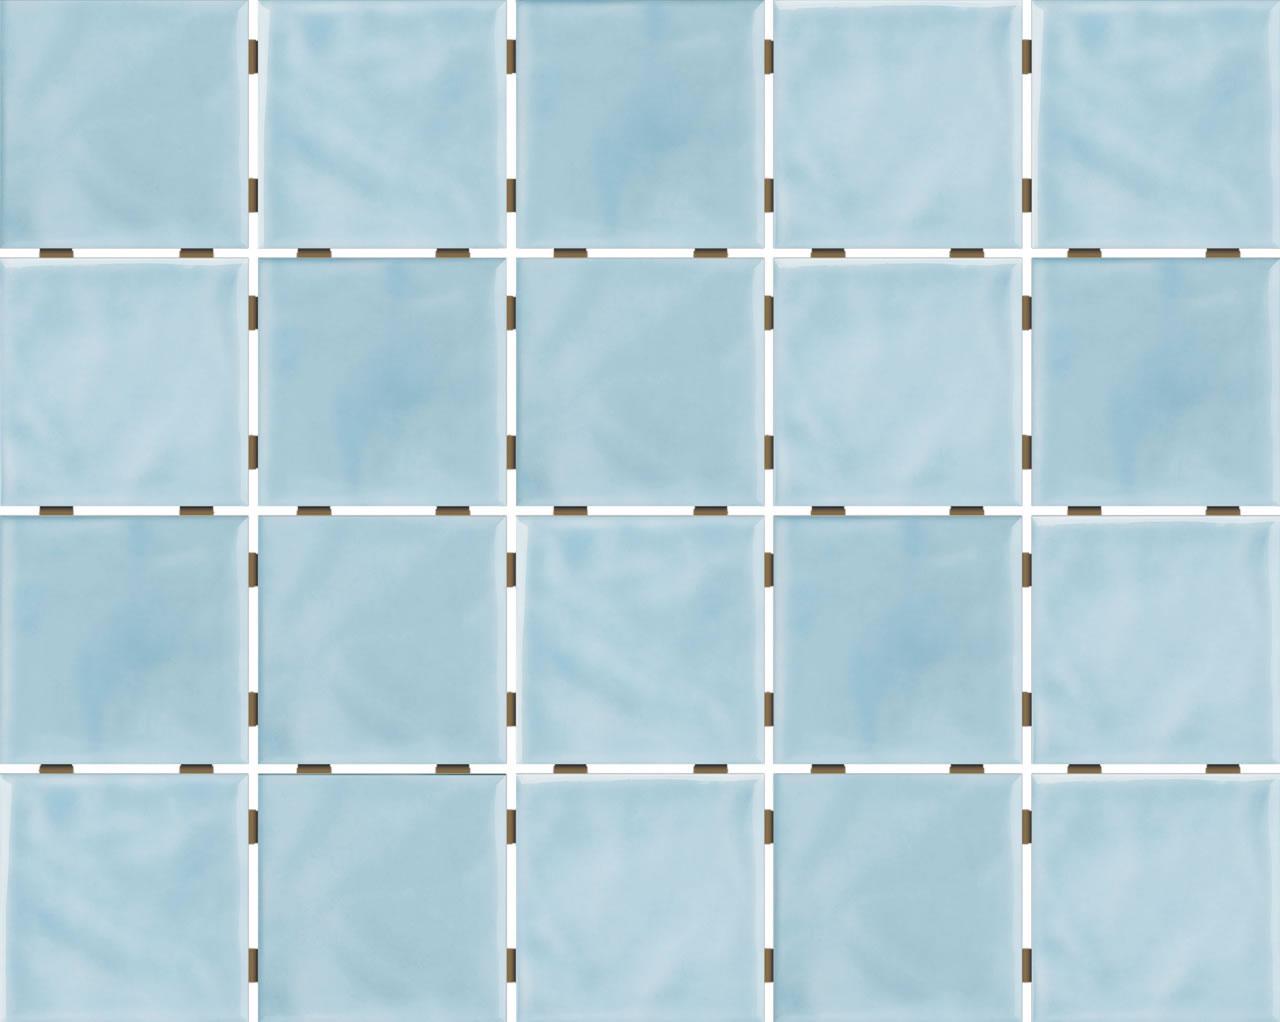 azul ceu onda mesh br 7,5×7,5